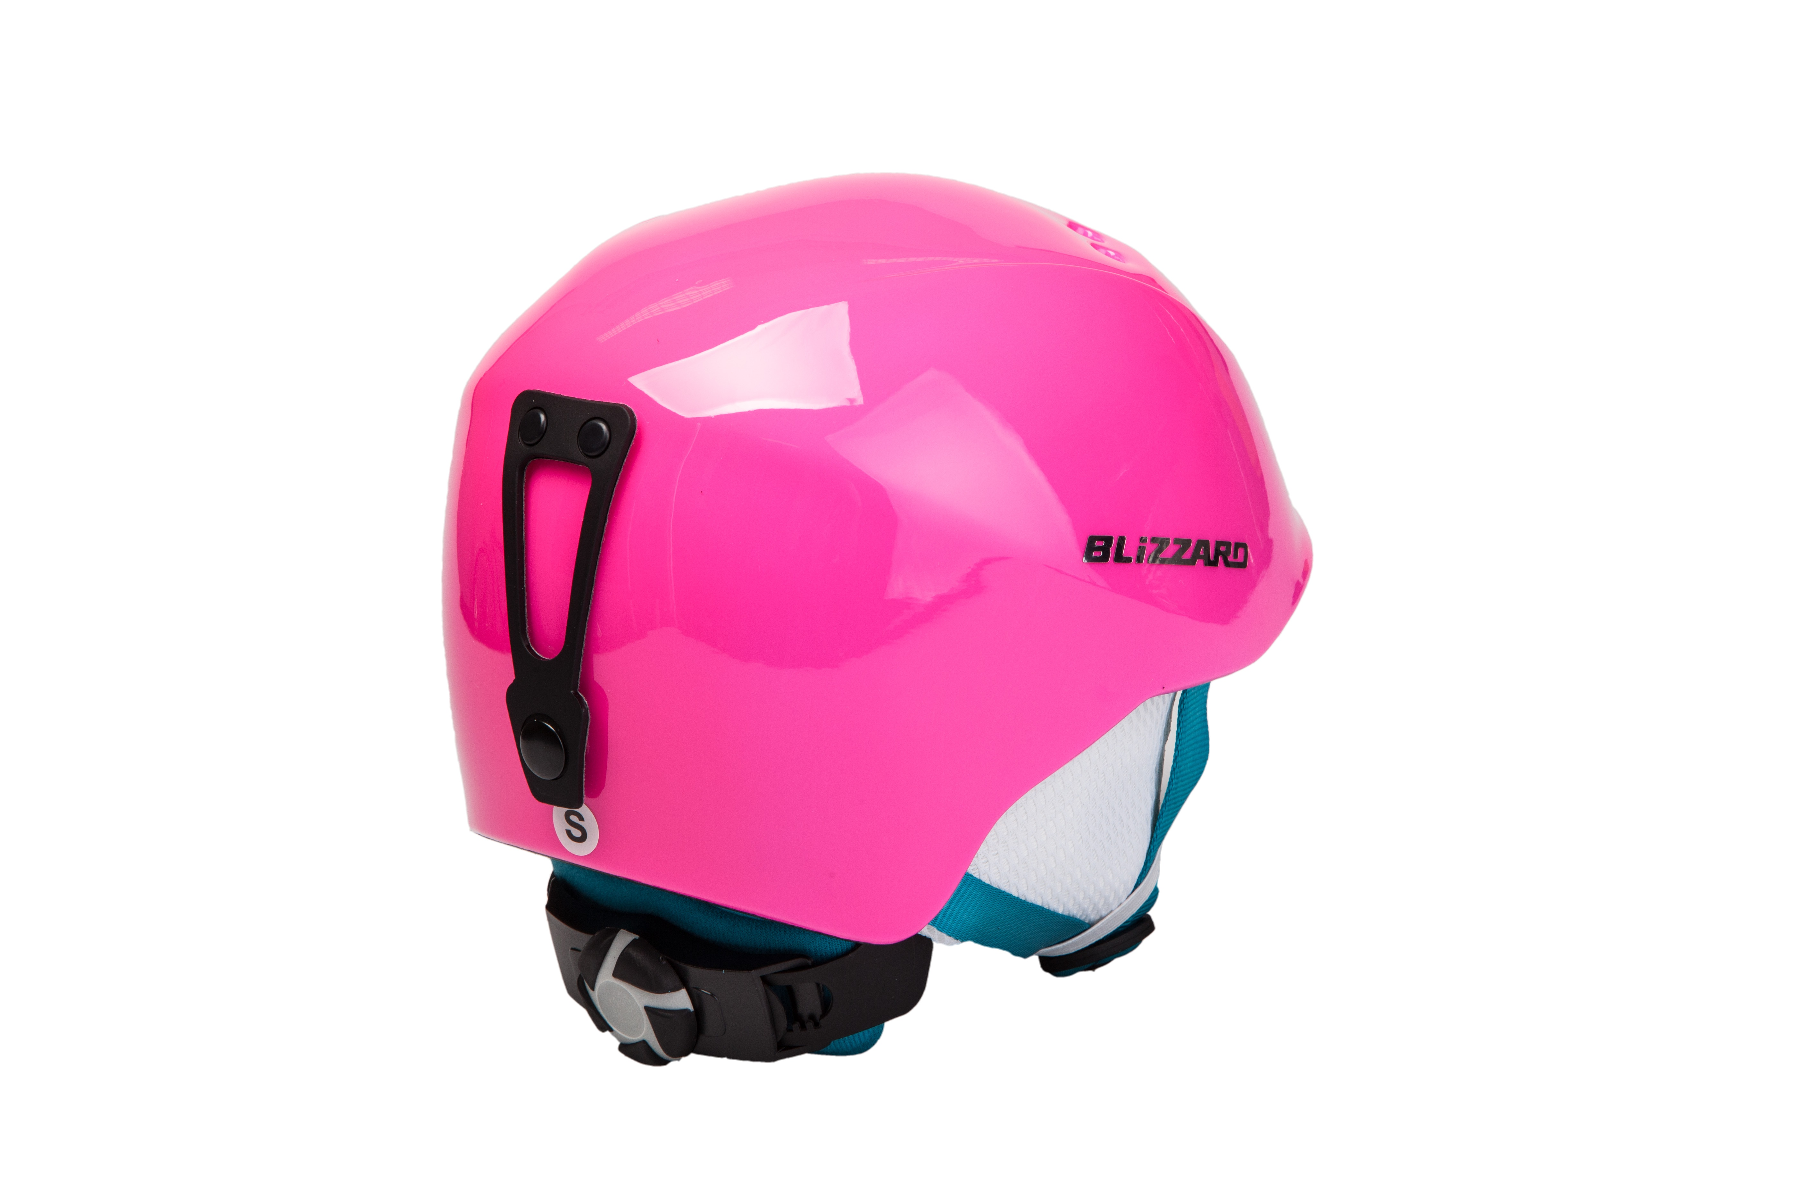 SIGNAL ski helmet, pink